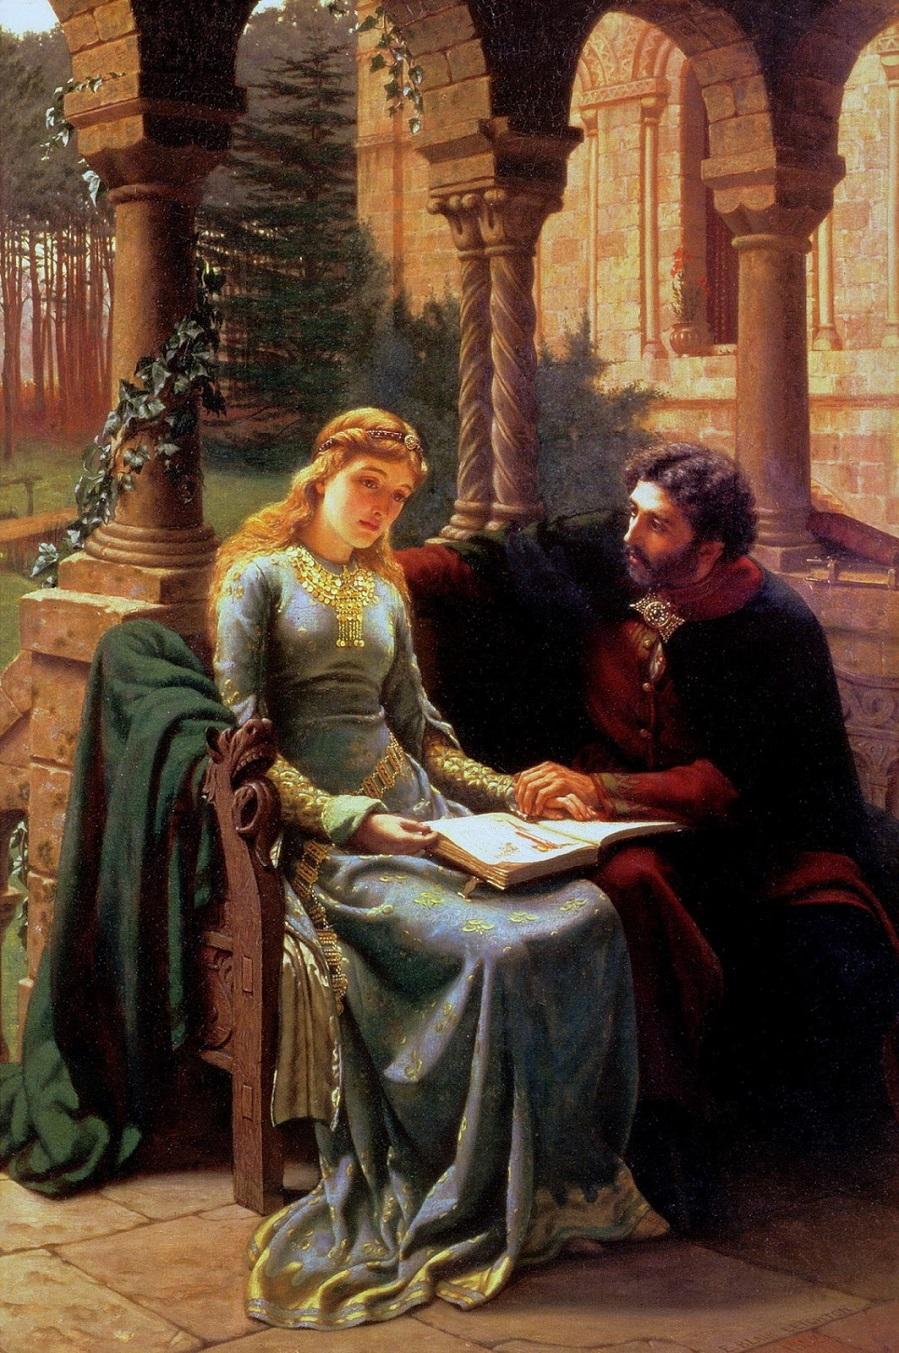 1882 Абеляр и его ученица Элоиза (Abelard and his Pupil Helois)